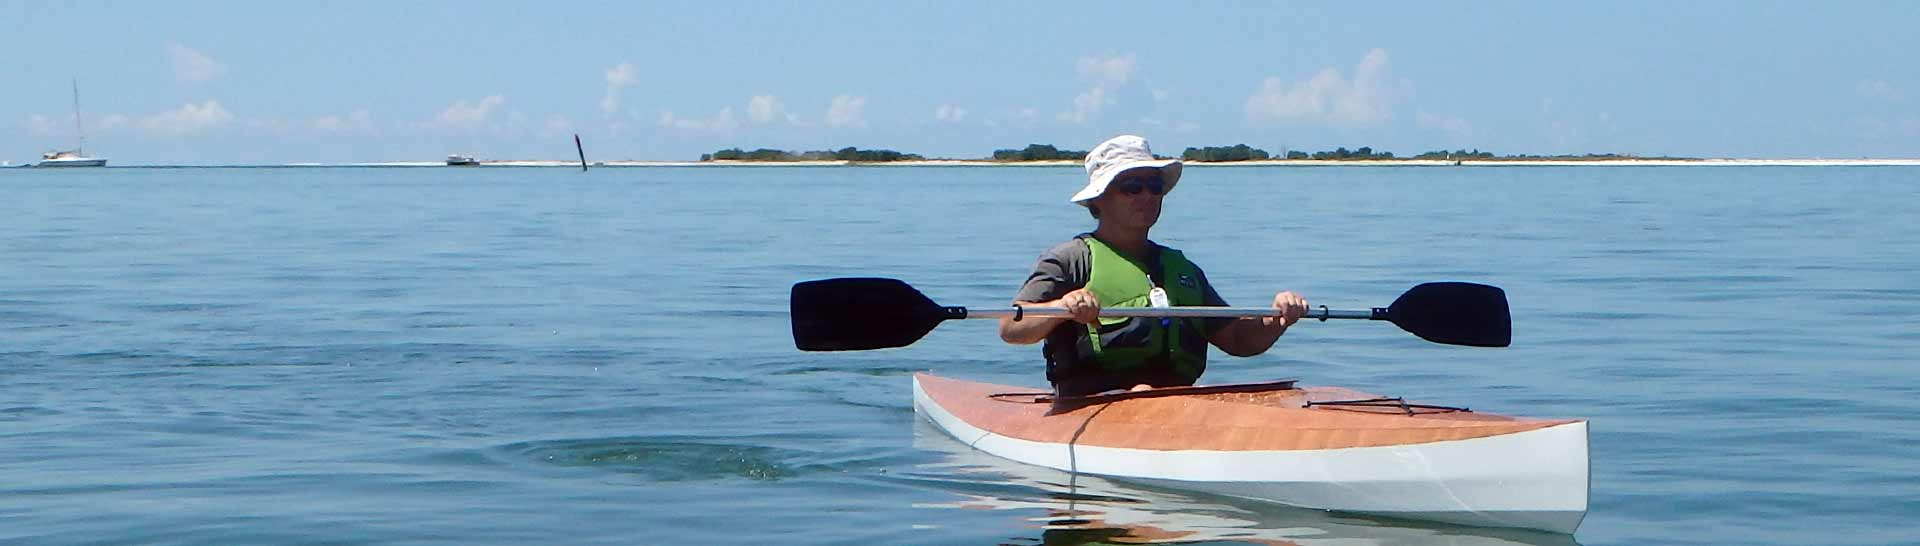 Bedard Yacht Design | Boat plans, marine plywood kits & custom designs